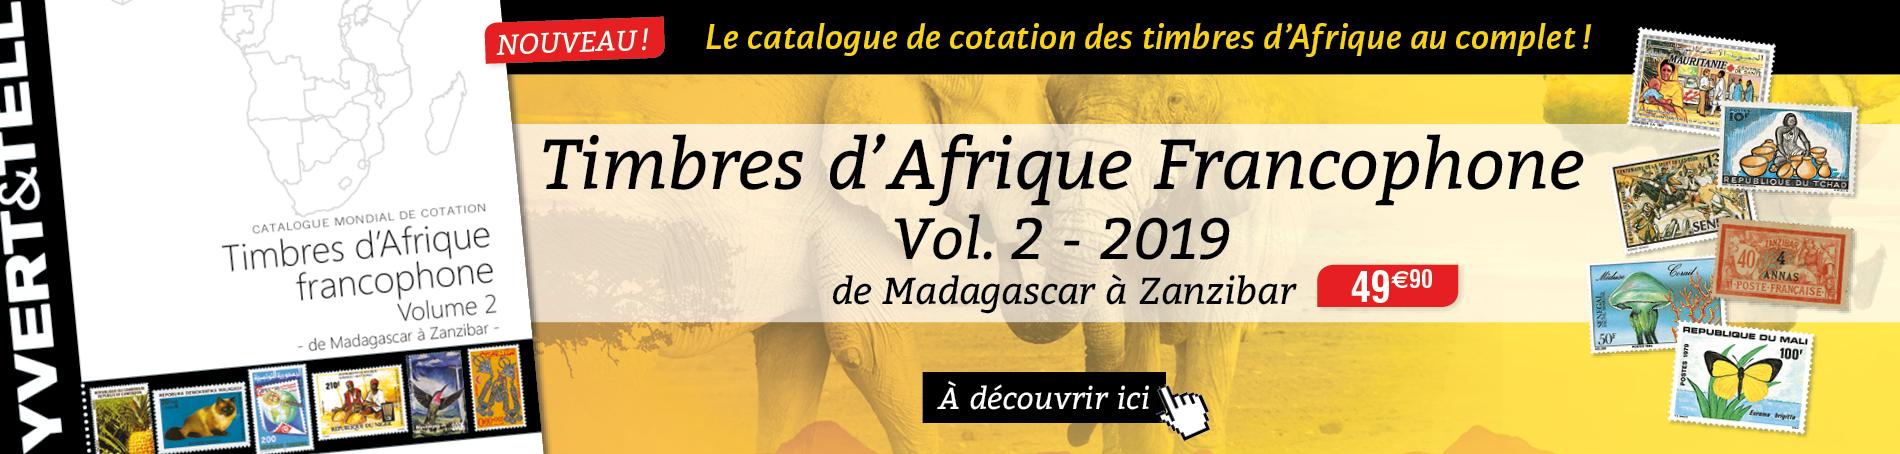 24-AFRIQUE-FR-133224